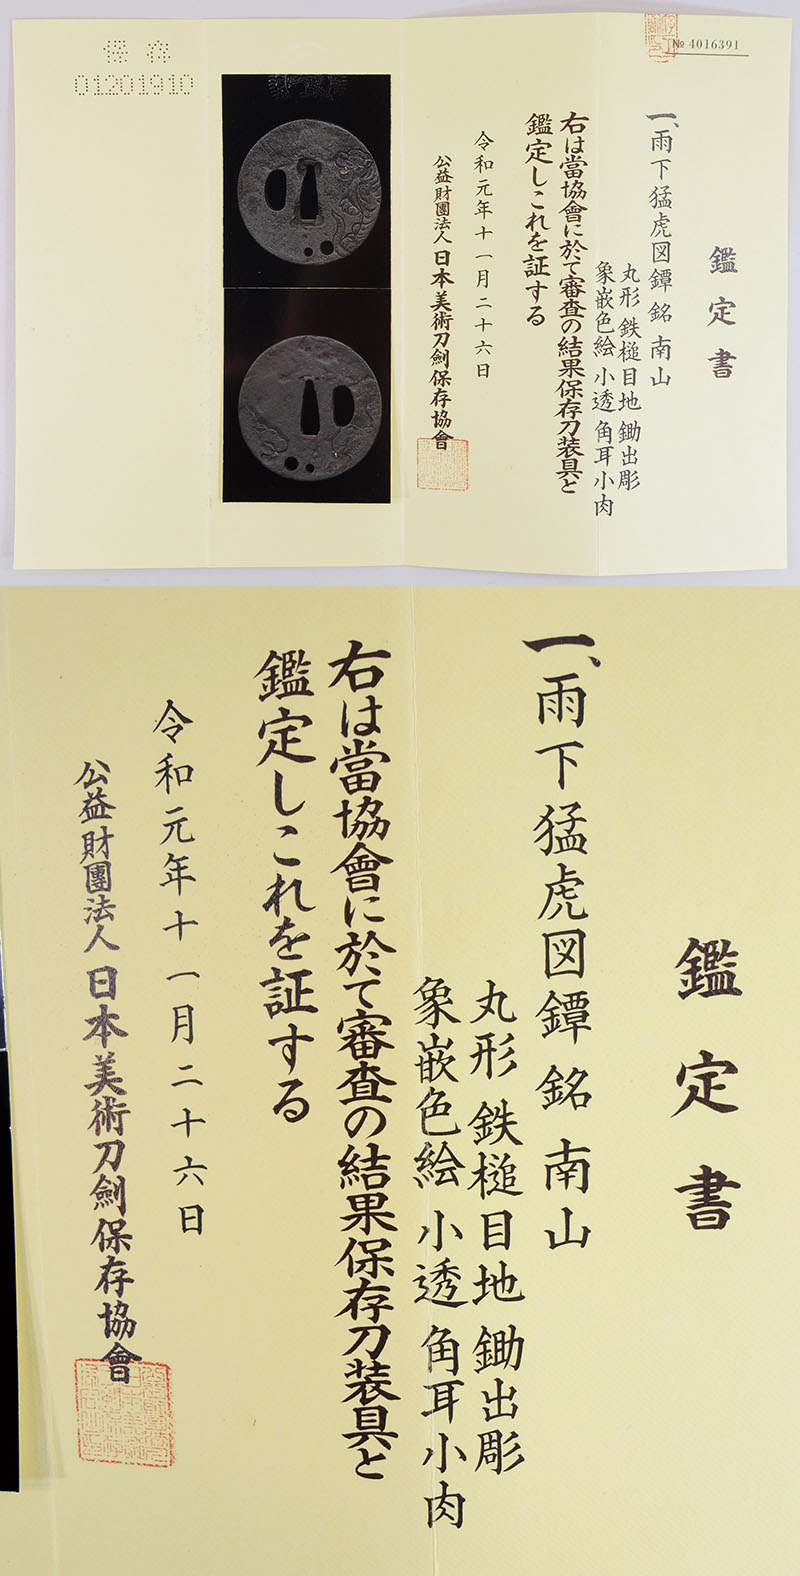 雨下猛虎図鍔 南山 Picture of Certificate